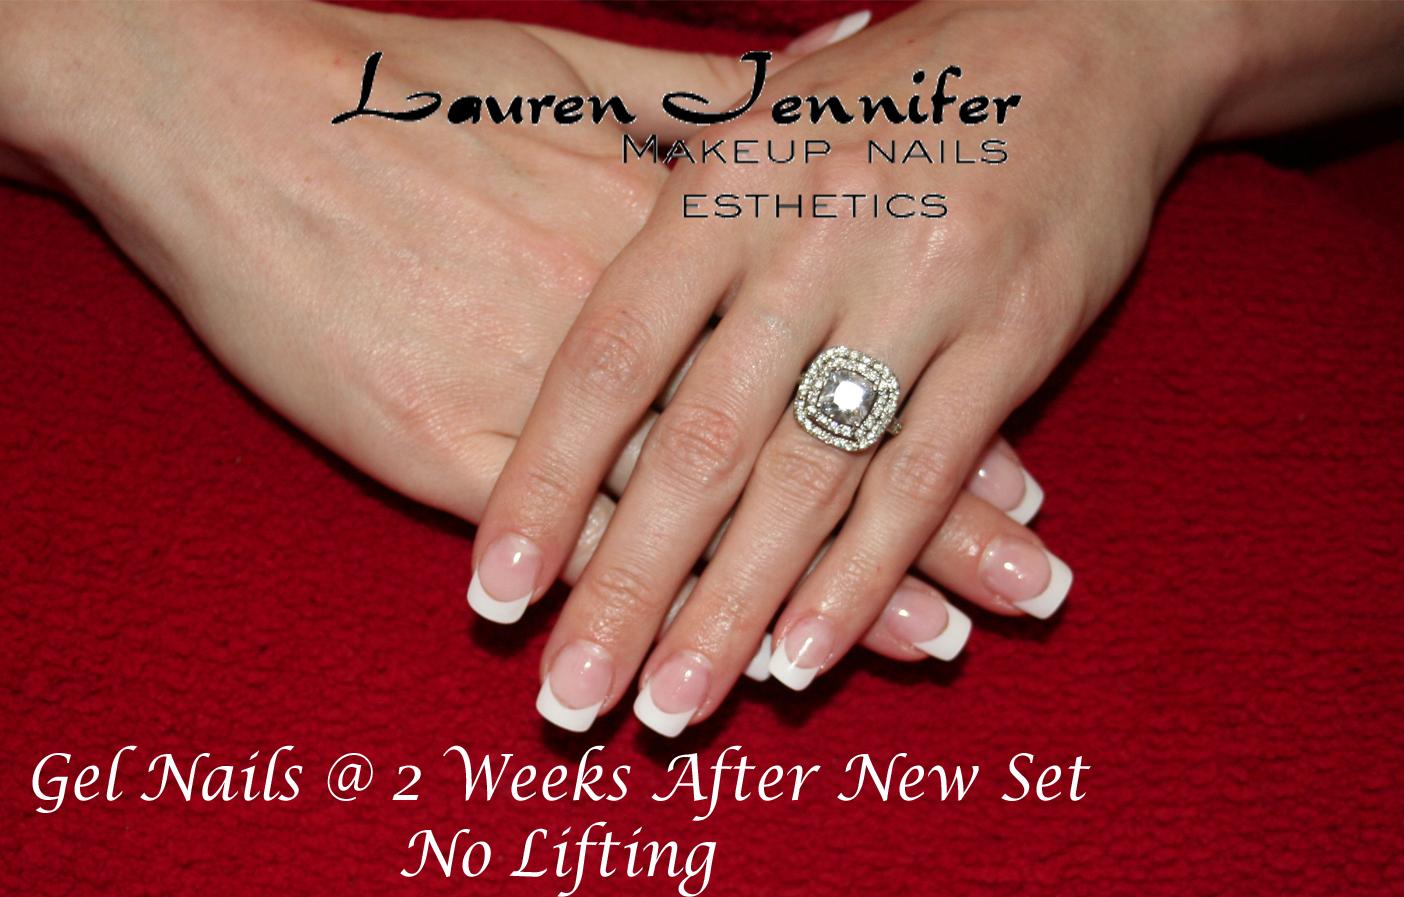 Lauren Jennifer In Style: PORTFOLIO